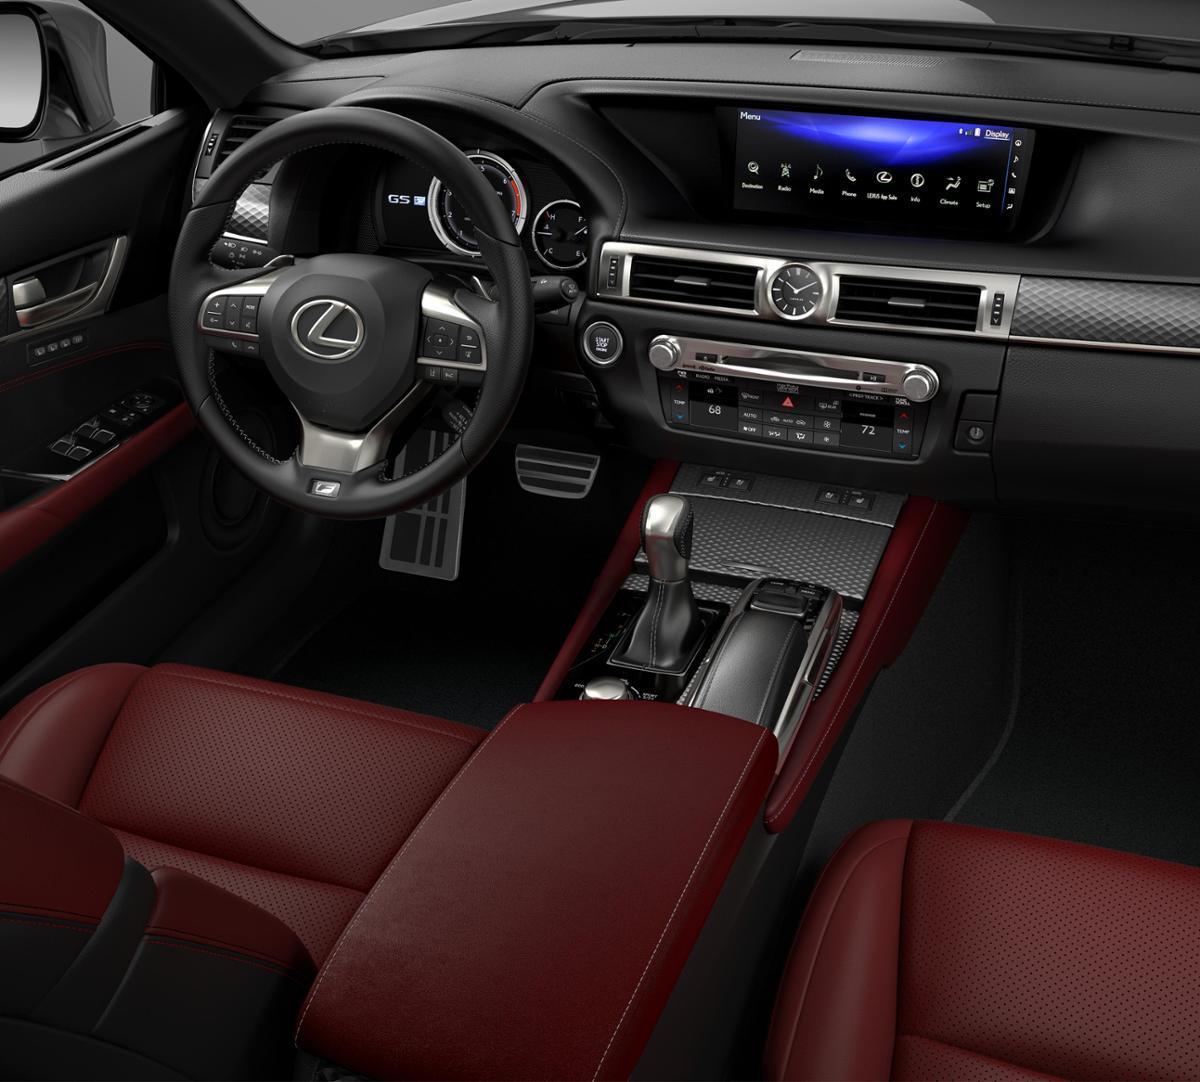 Lexus Gs For Sale: 2017 Smoky Granite Mica F SPORT Lexus GS 350 For Sale In